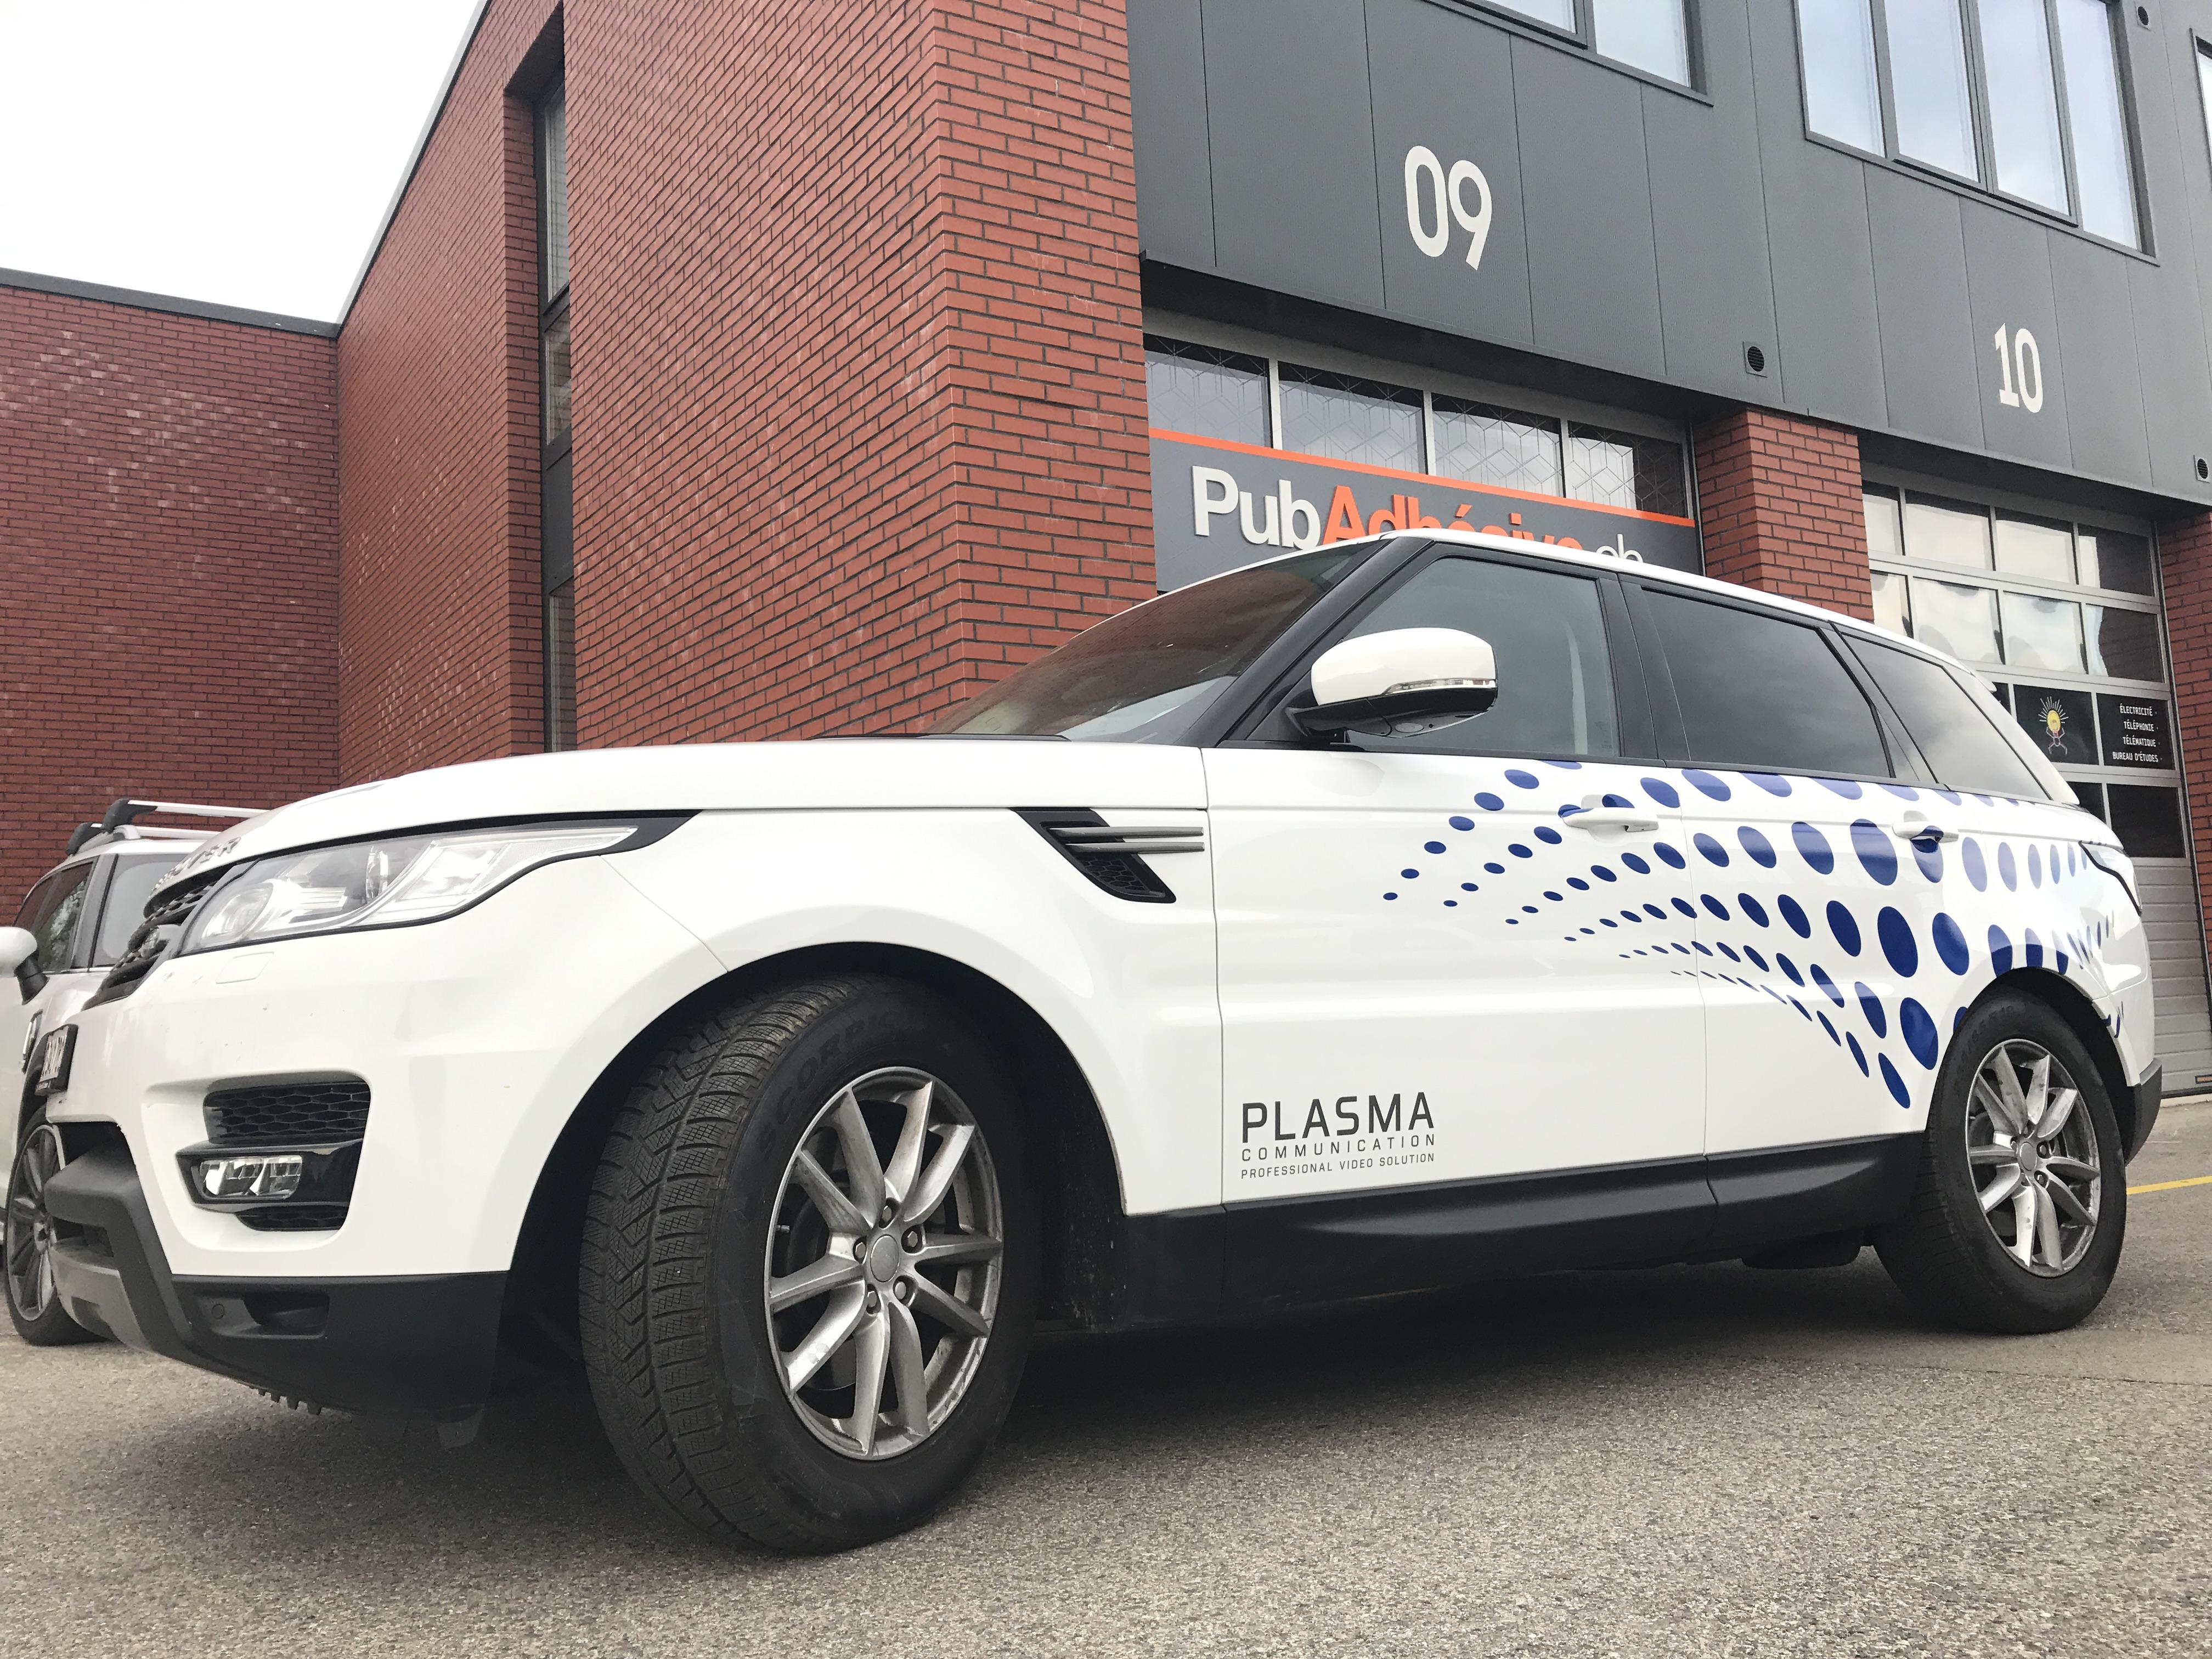 Plasma Communication - PubAdhésive